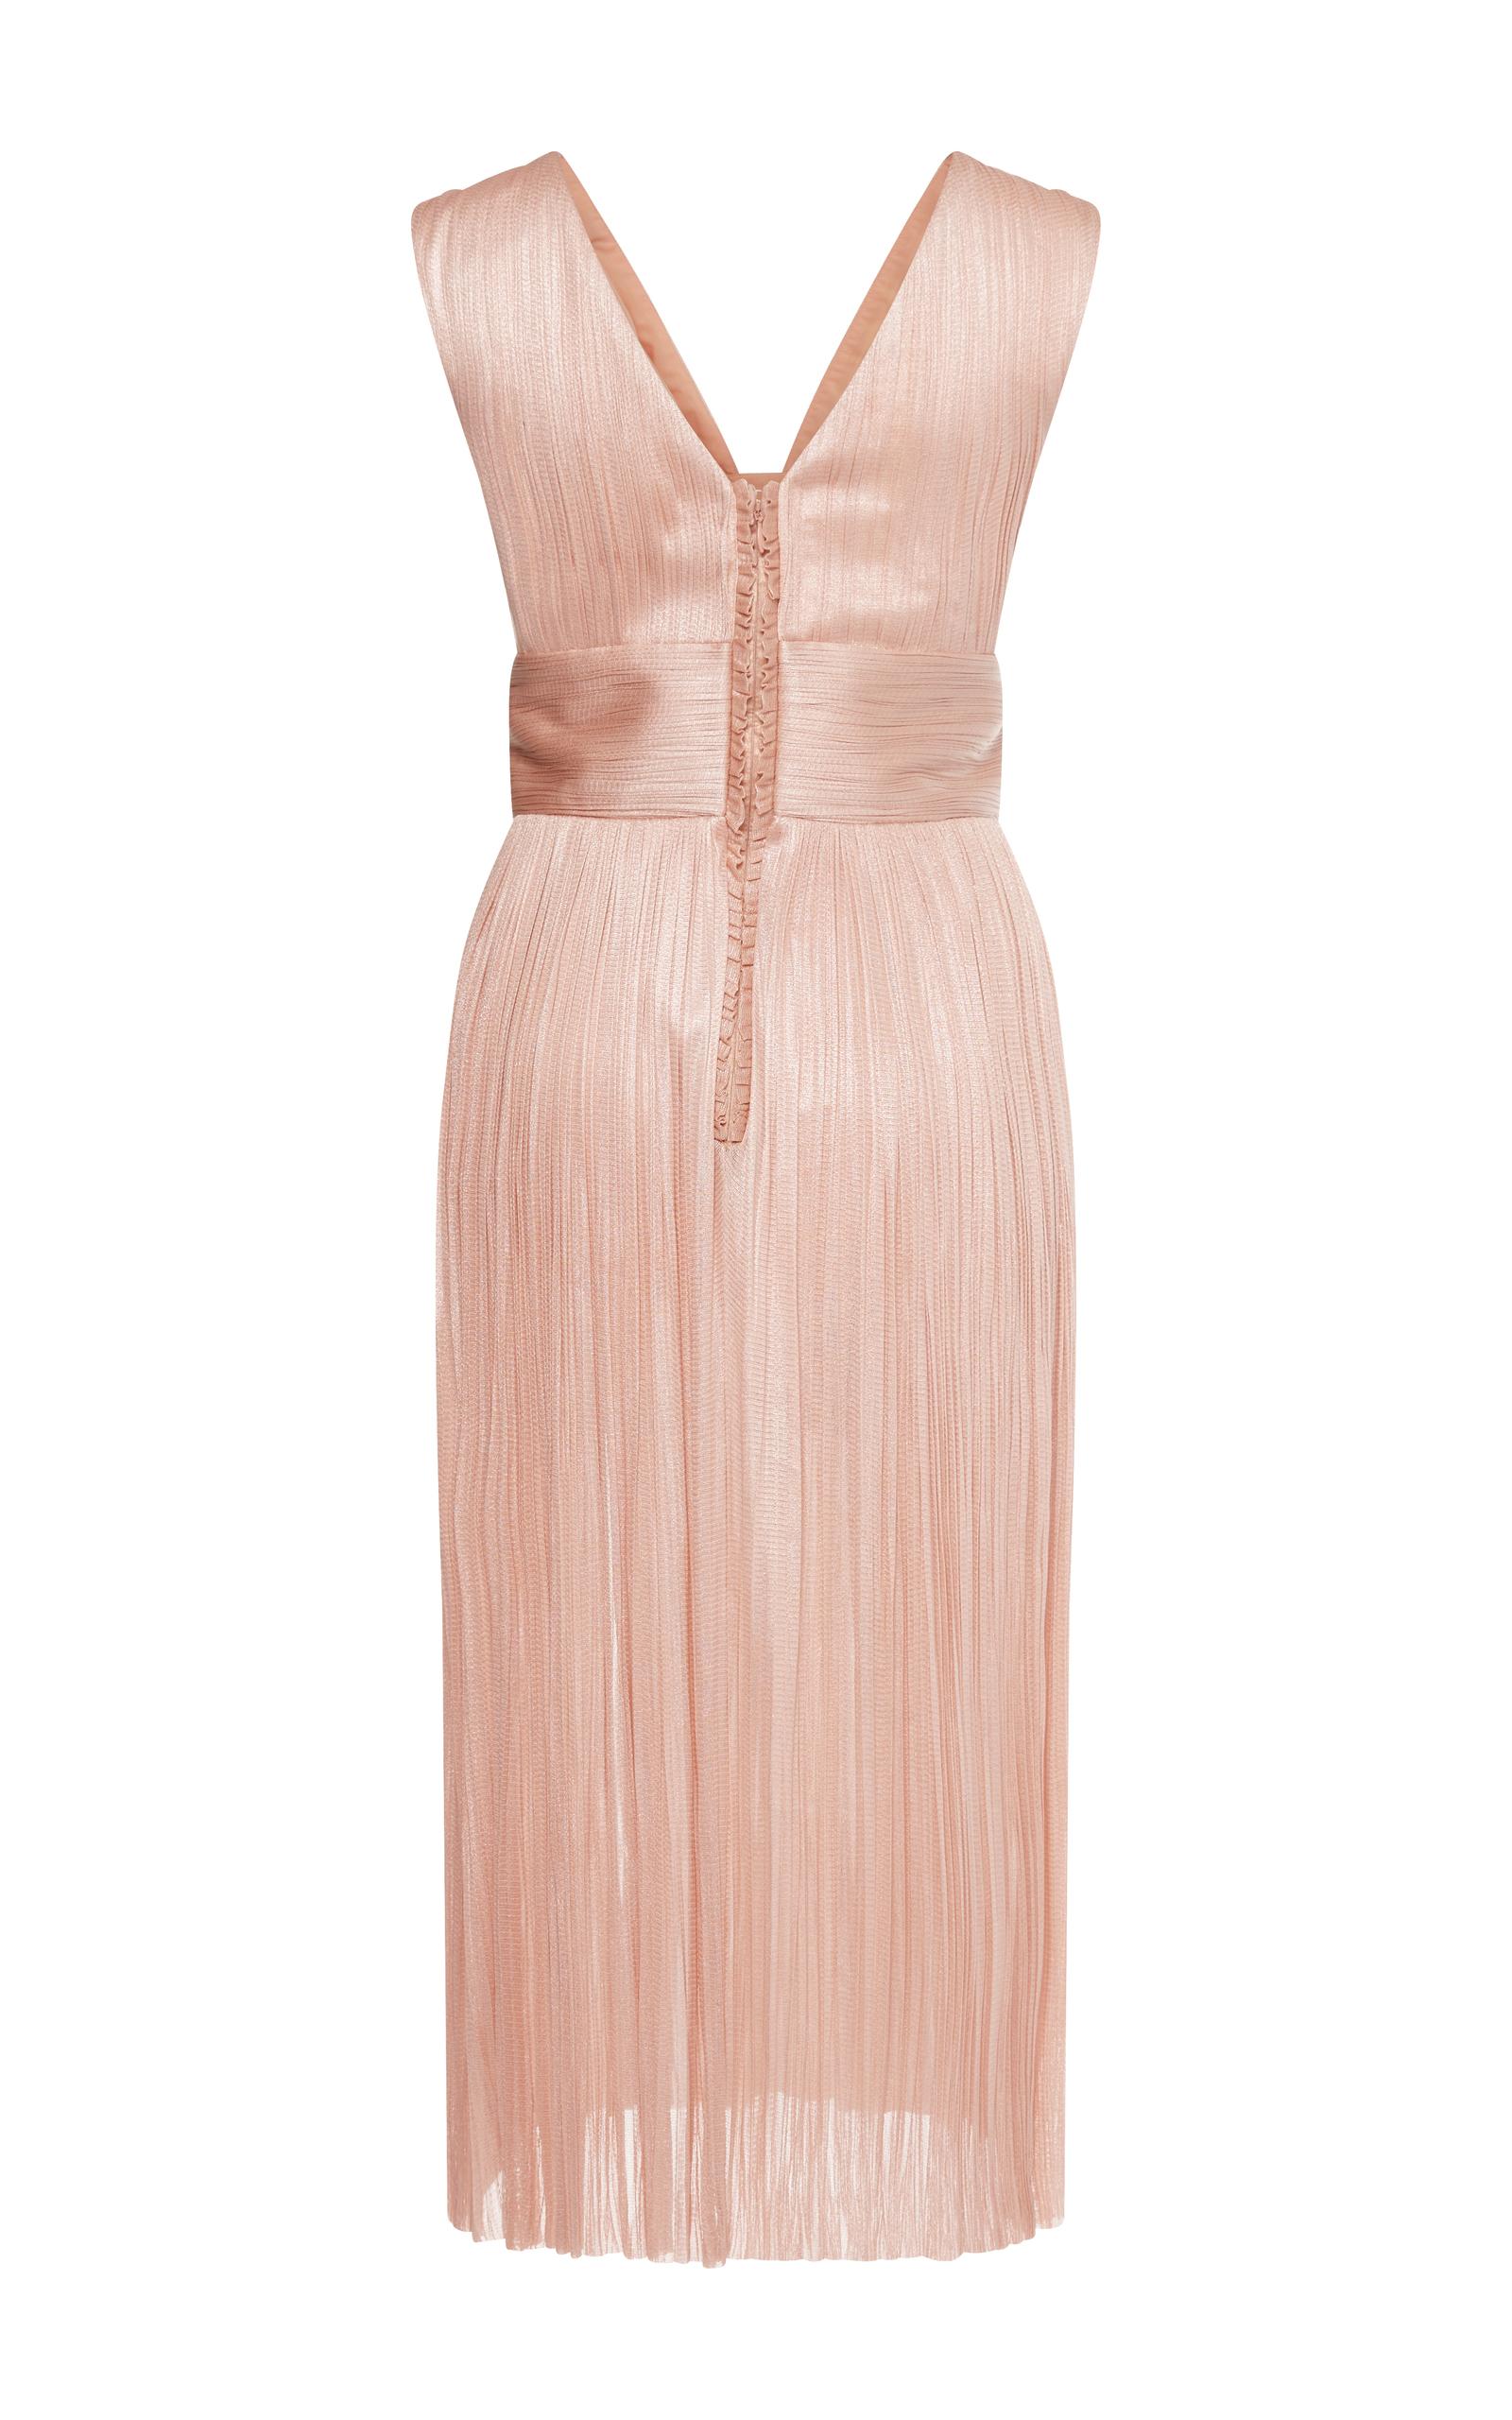 Temperley aurora satin lace dress